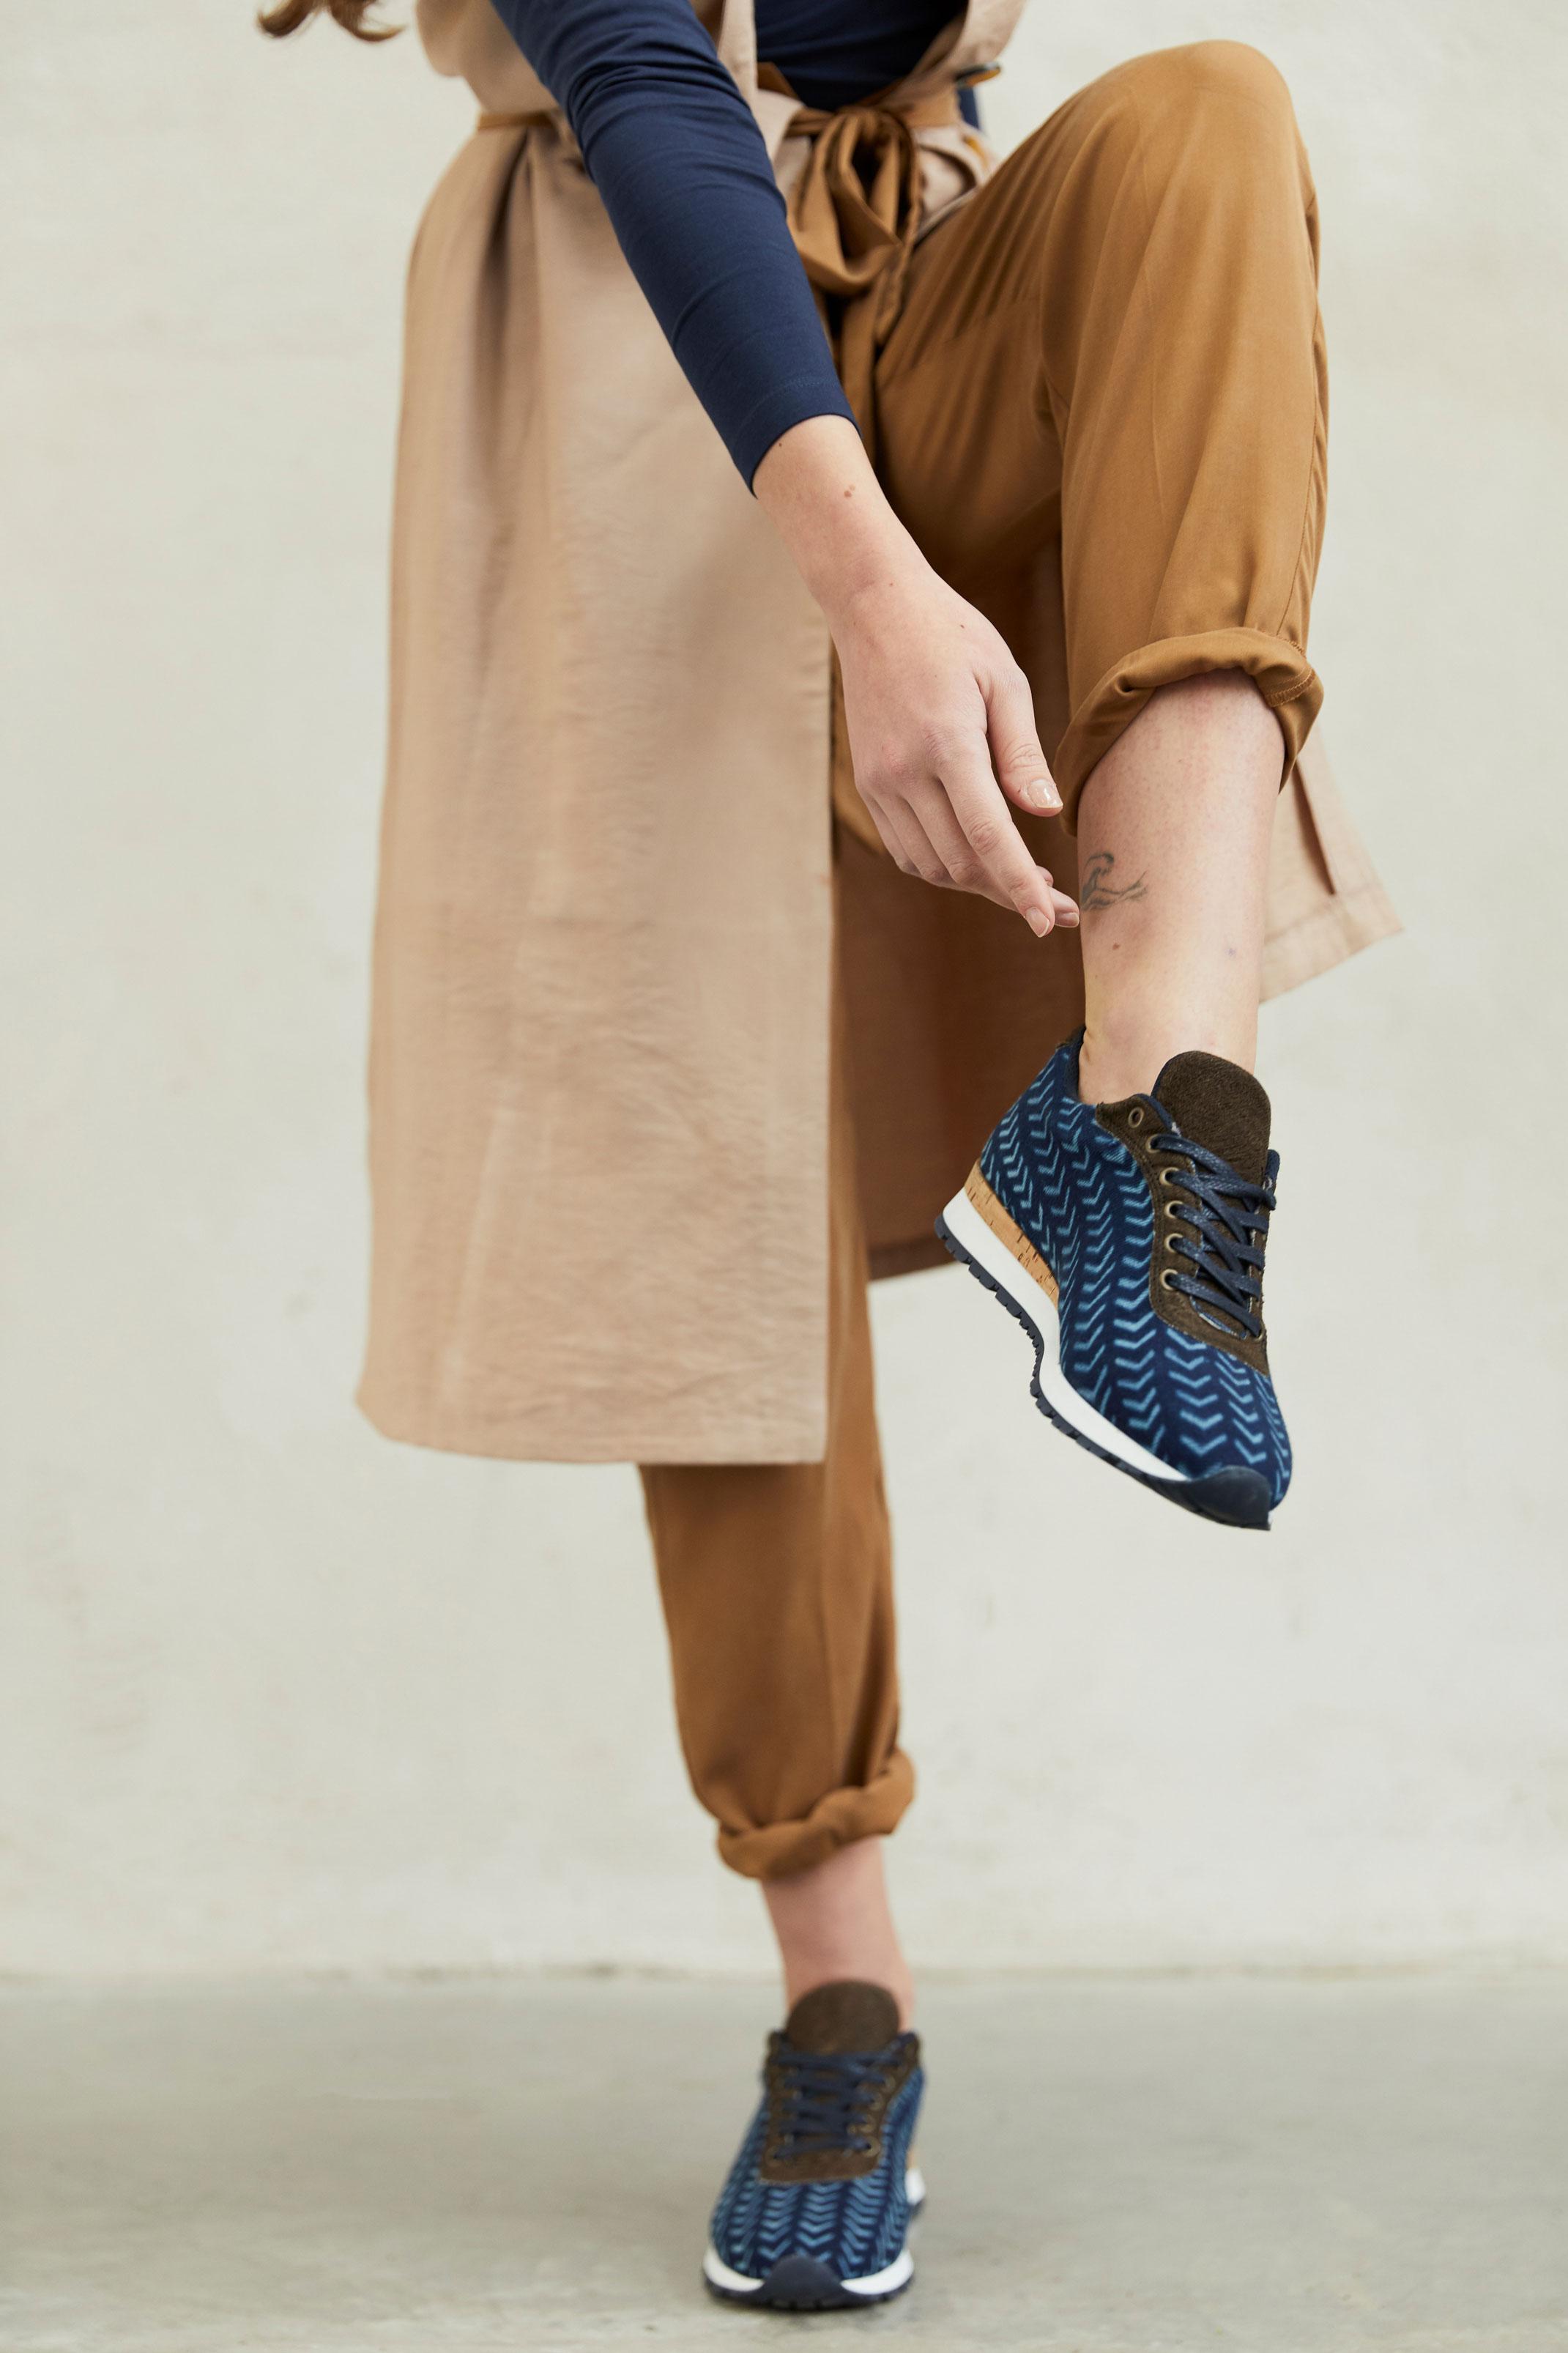 umoja chaussures lifestyle brest